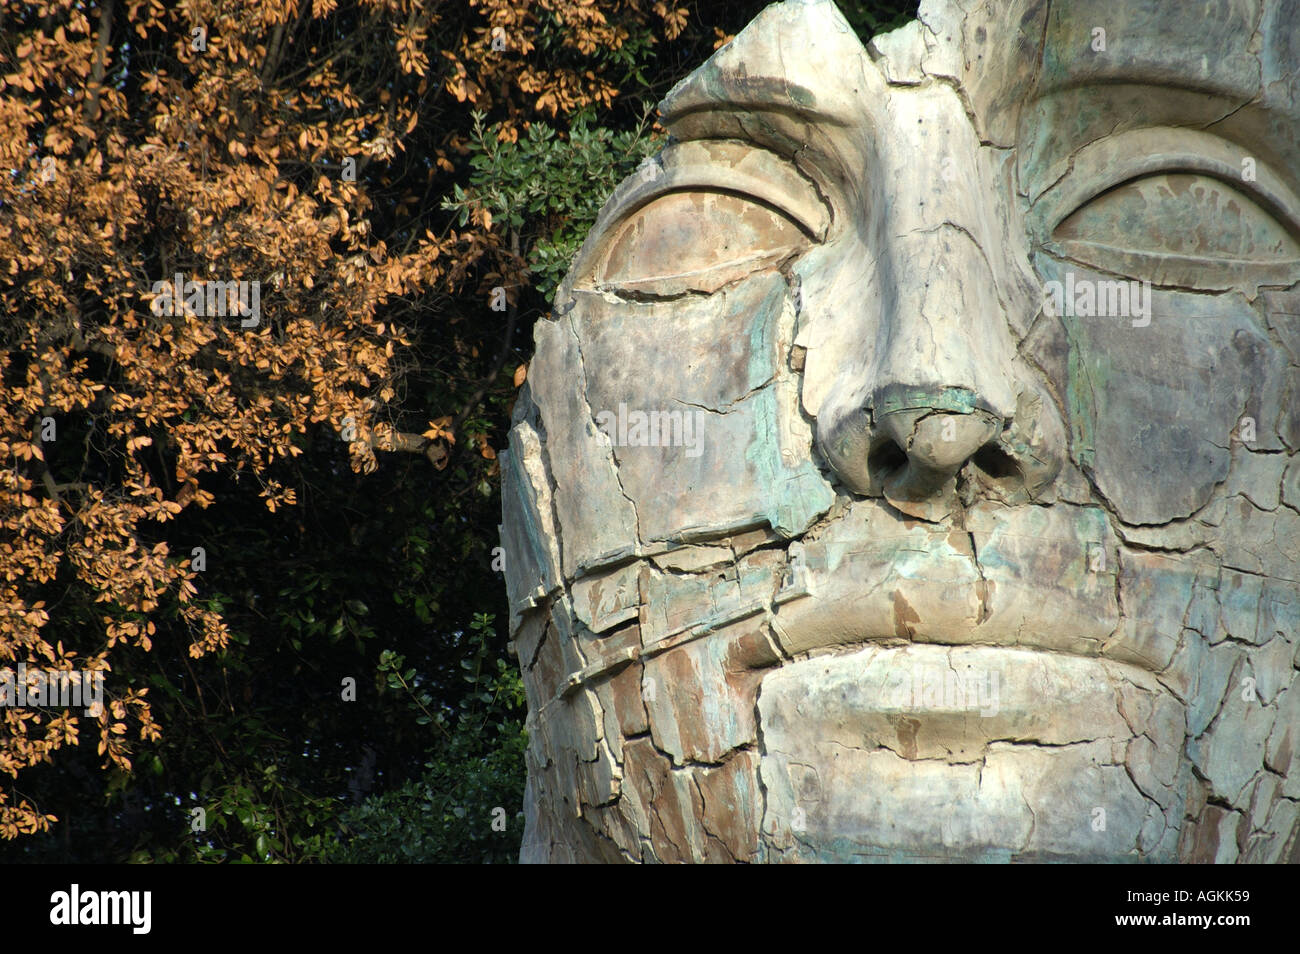 Tindaro screpolato statue in giardino di boboli florence - Statue giardino ...